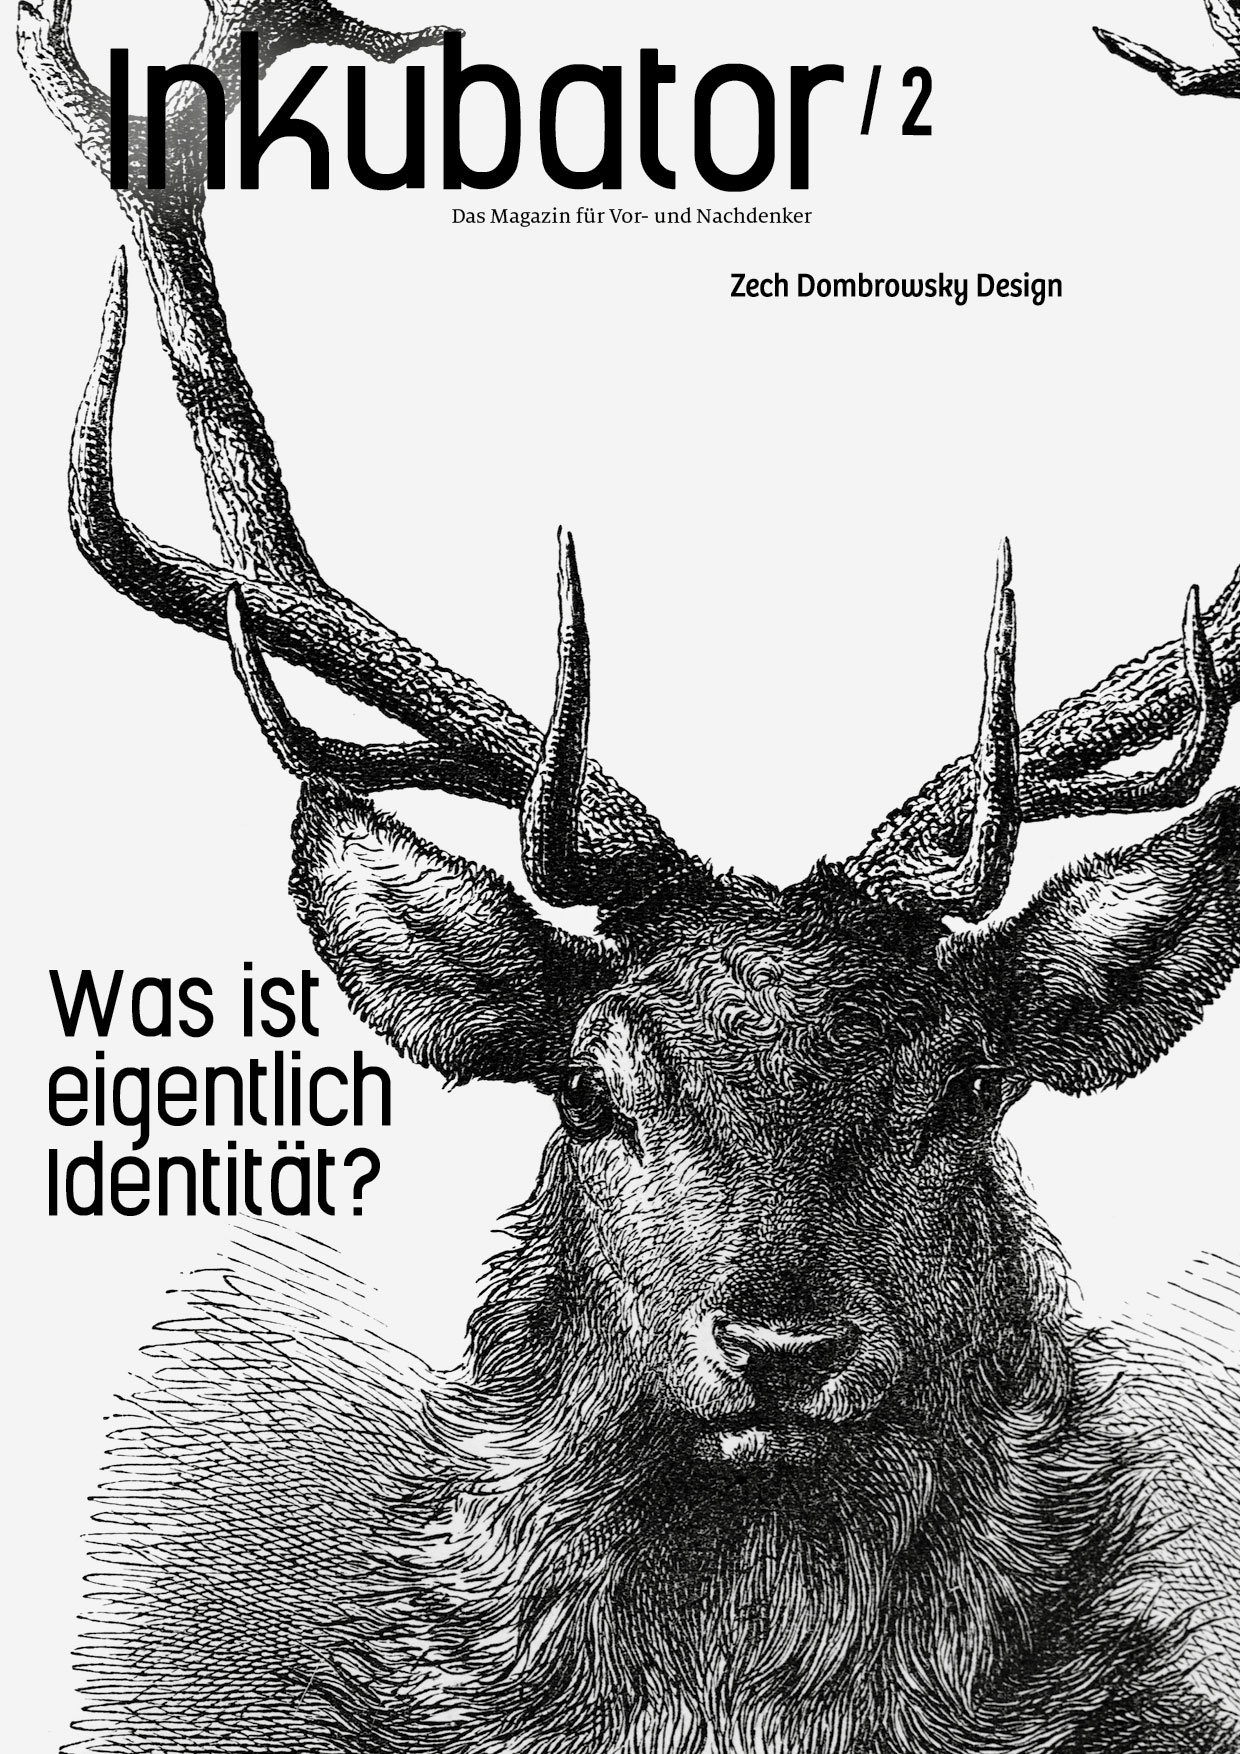 Inkubator-Titelblatt des Hausmagazins von Zech Dombrowsky Design